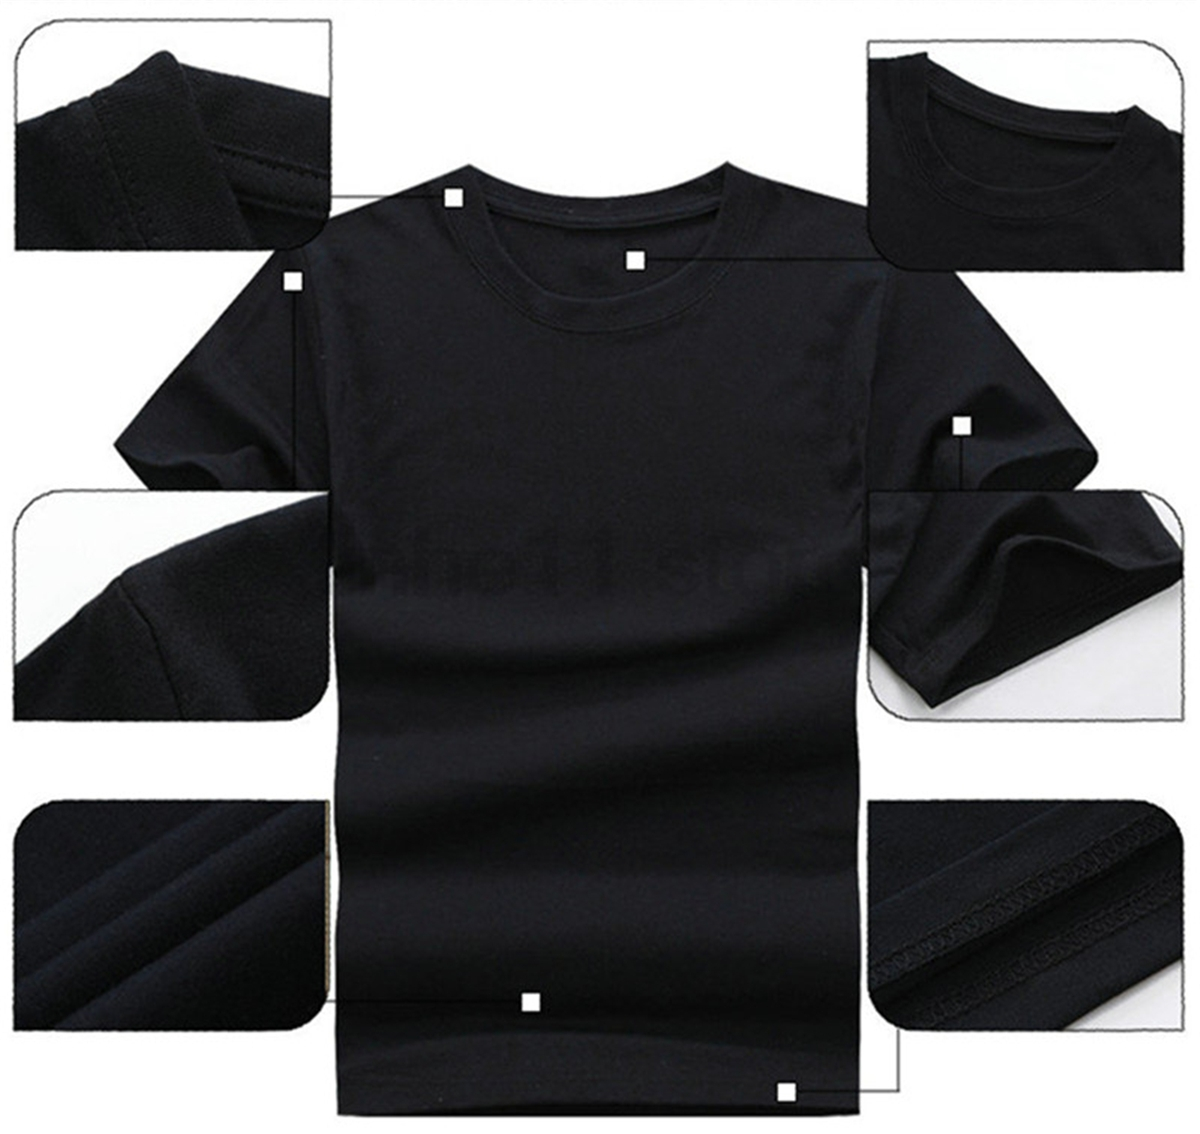 GILDAN Christmas Ugly Sweater Truck Driver Profession Tshirt Womens T-shirt